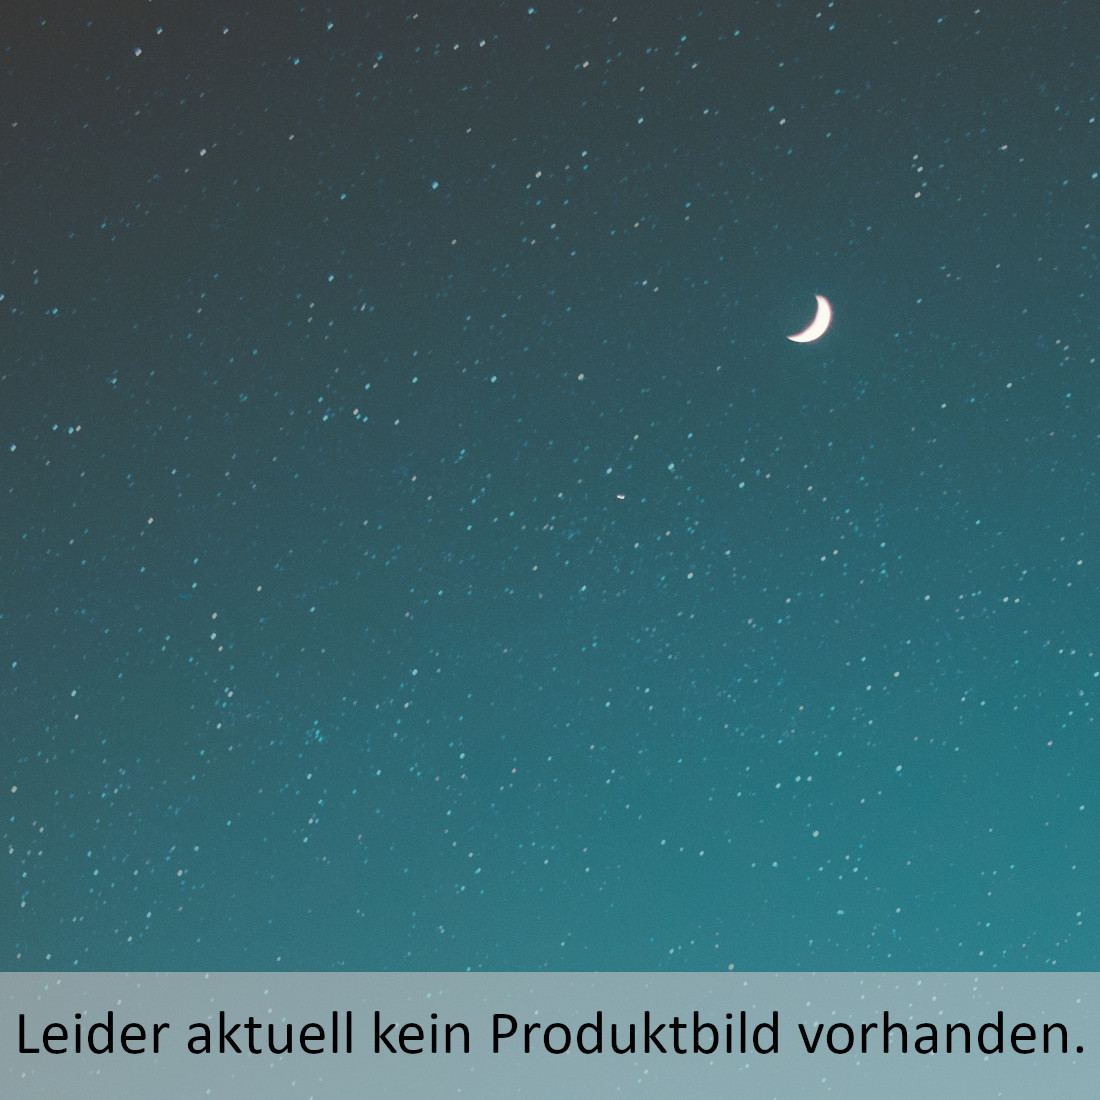 God around the clock Dreyer, Martin 9783629130518